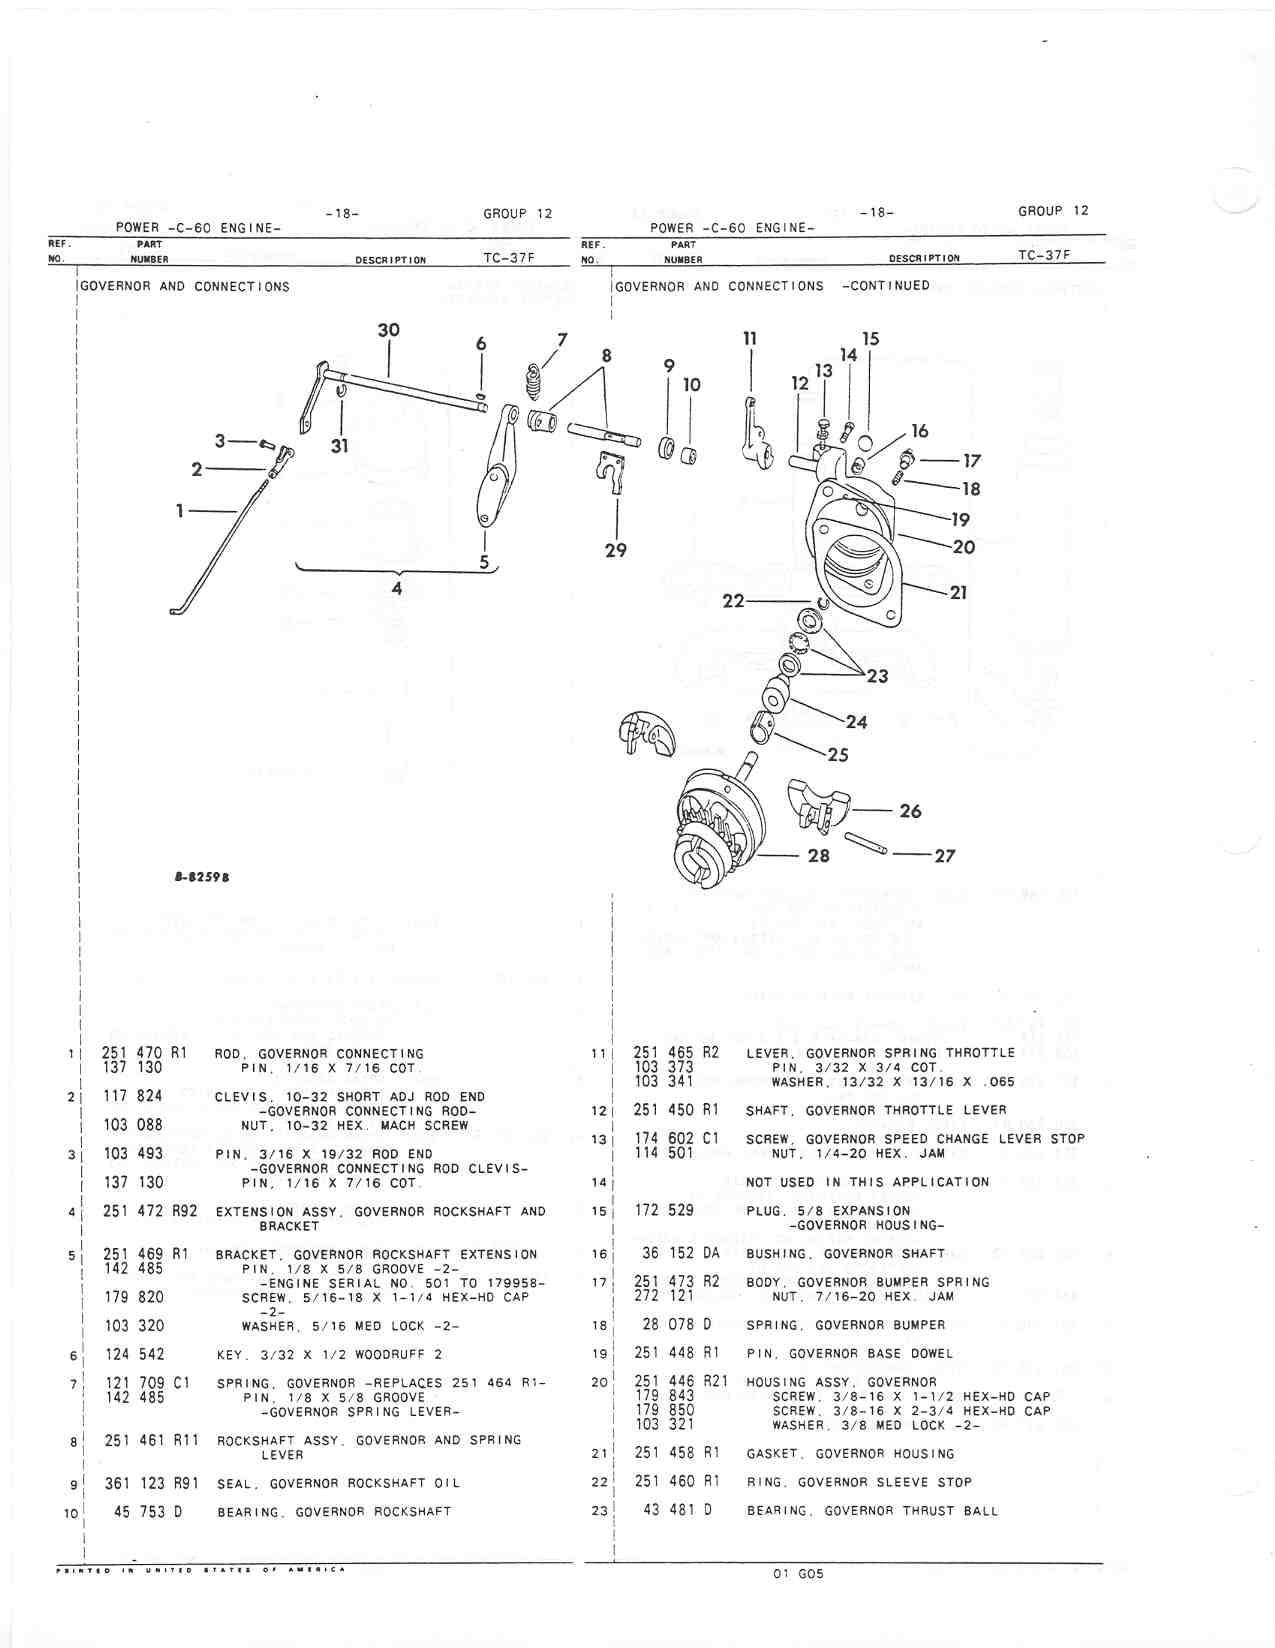 Farmall Super A Parts Diagram | My Wiring DIagram